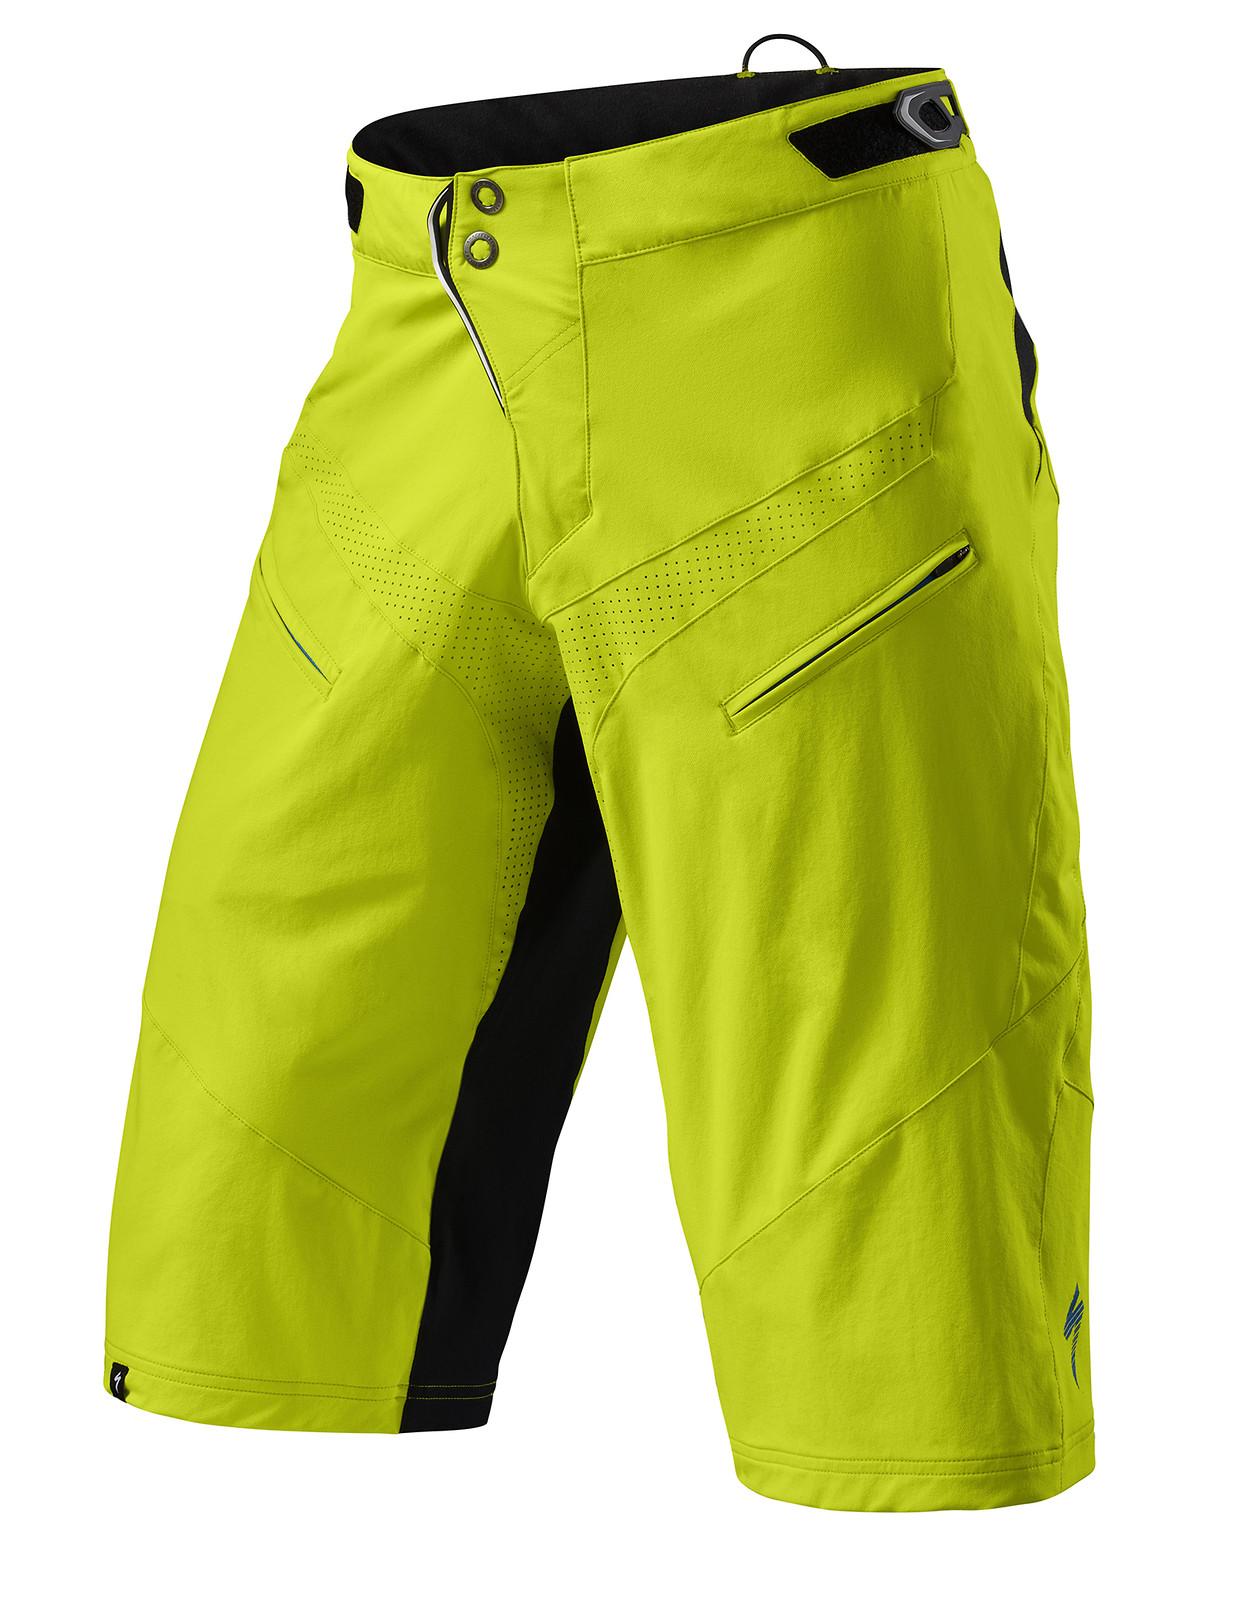 Specialized Demo Pro Short - hyper green:black